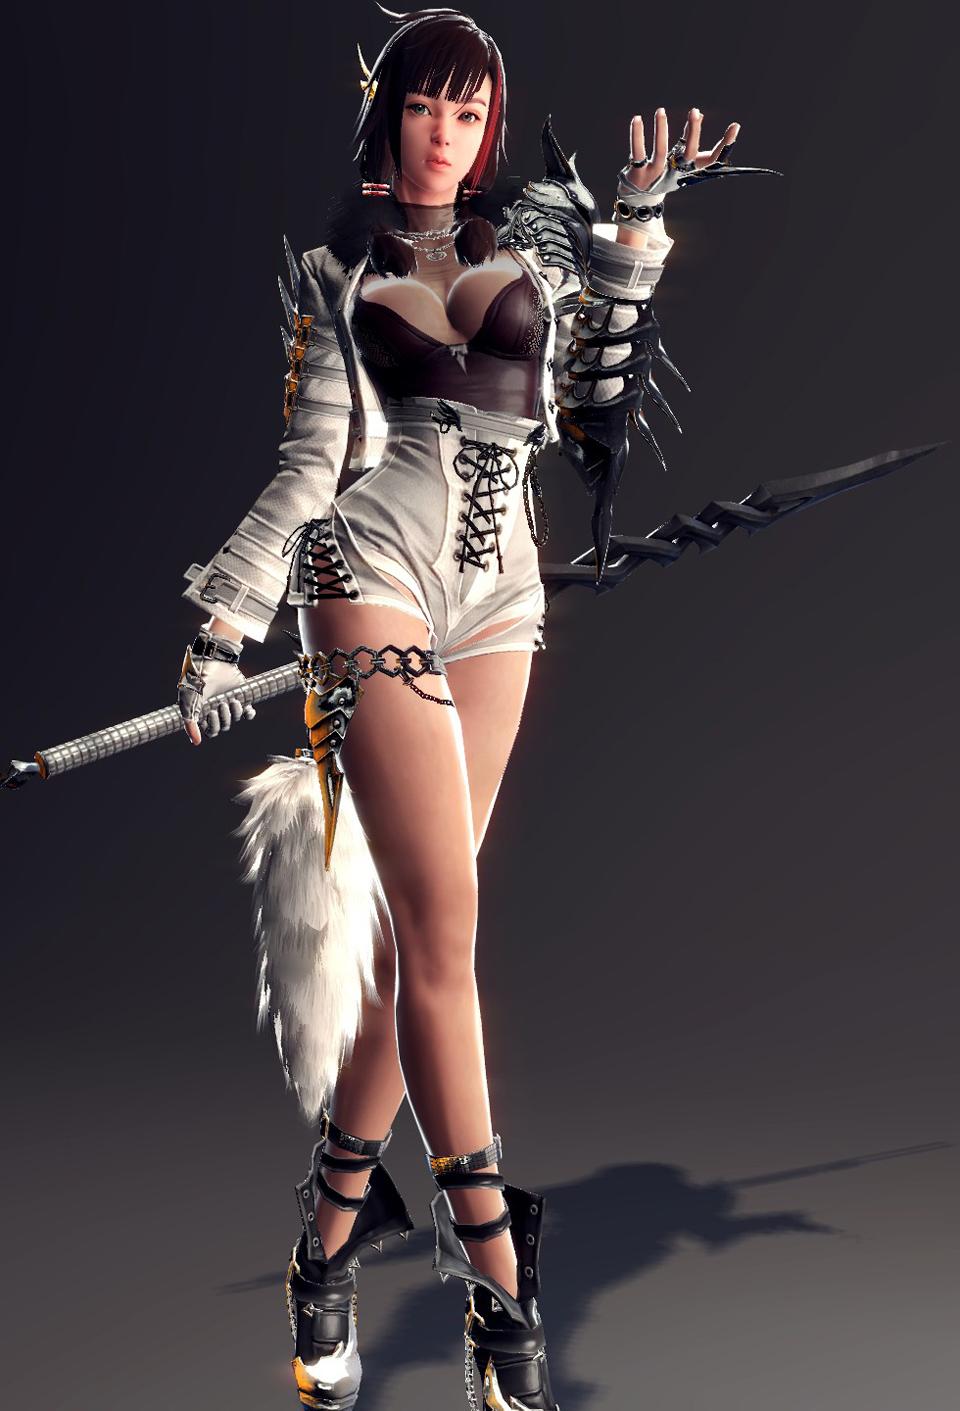 Mabinogi Heroes: Hot girl Arisha lộ ảnh nóng 4